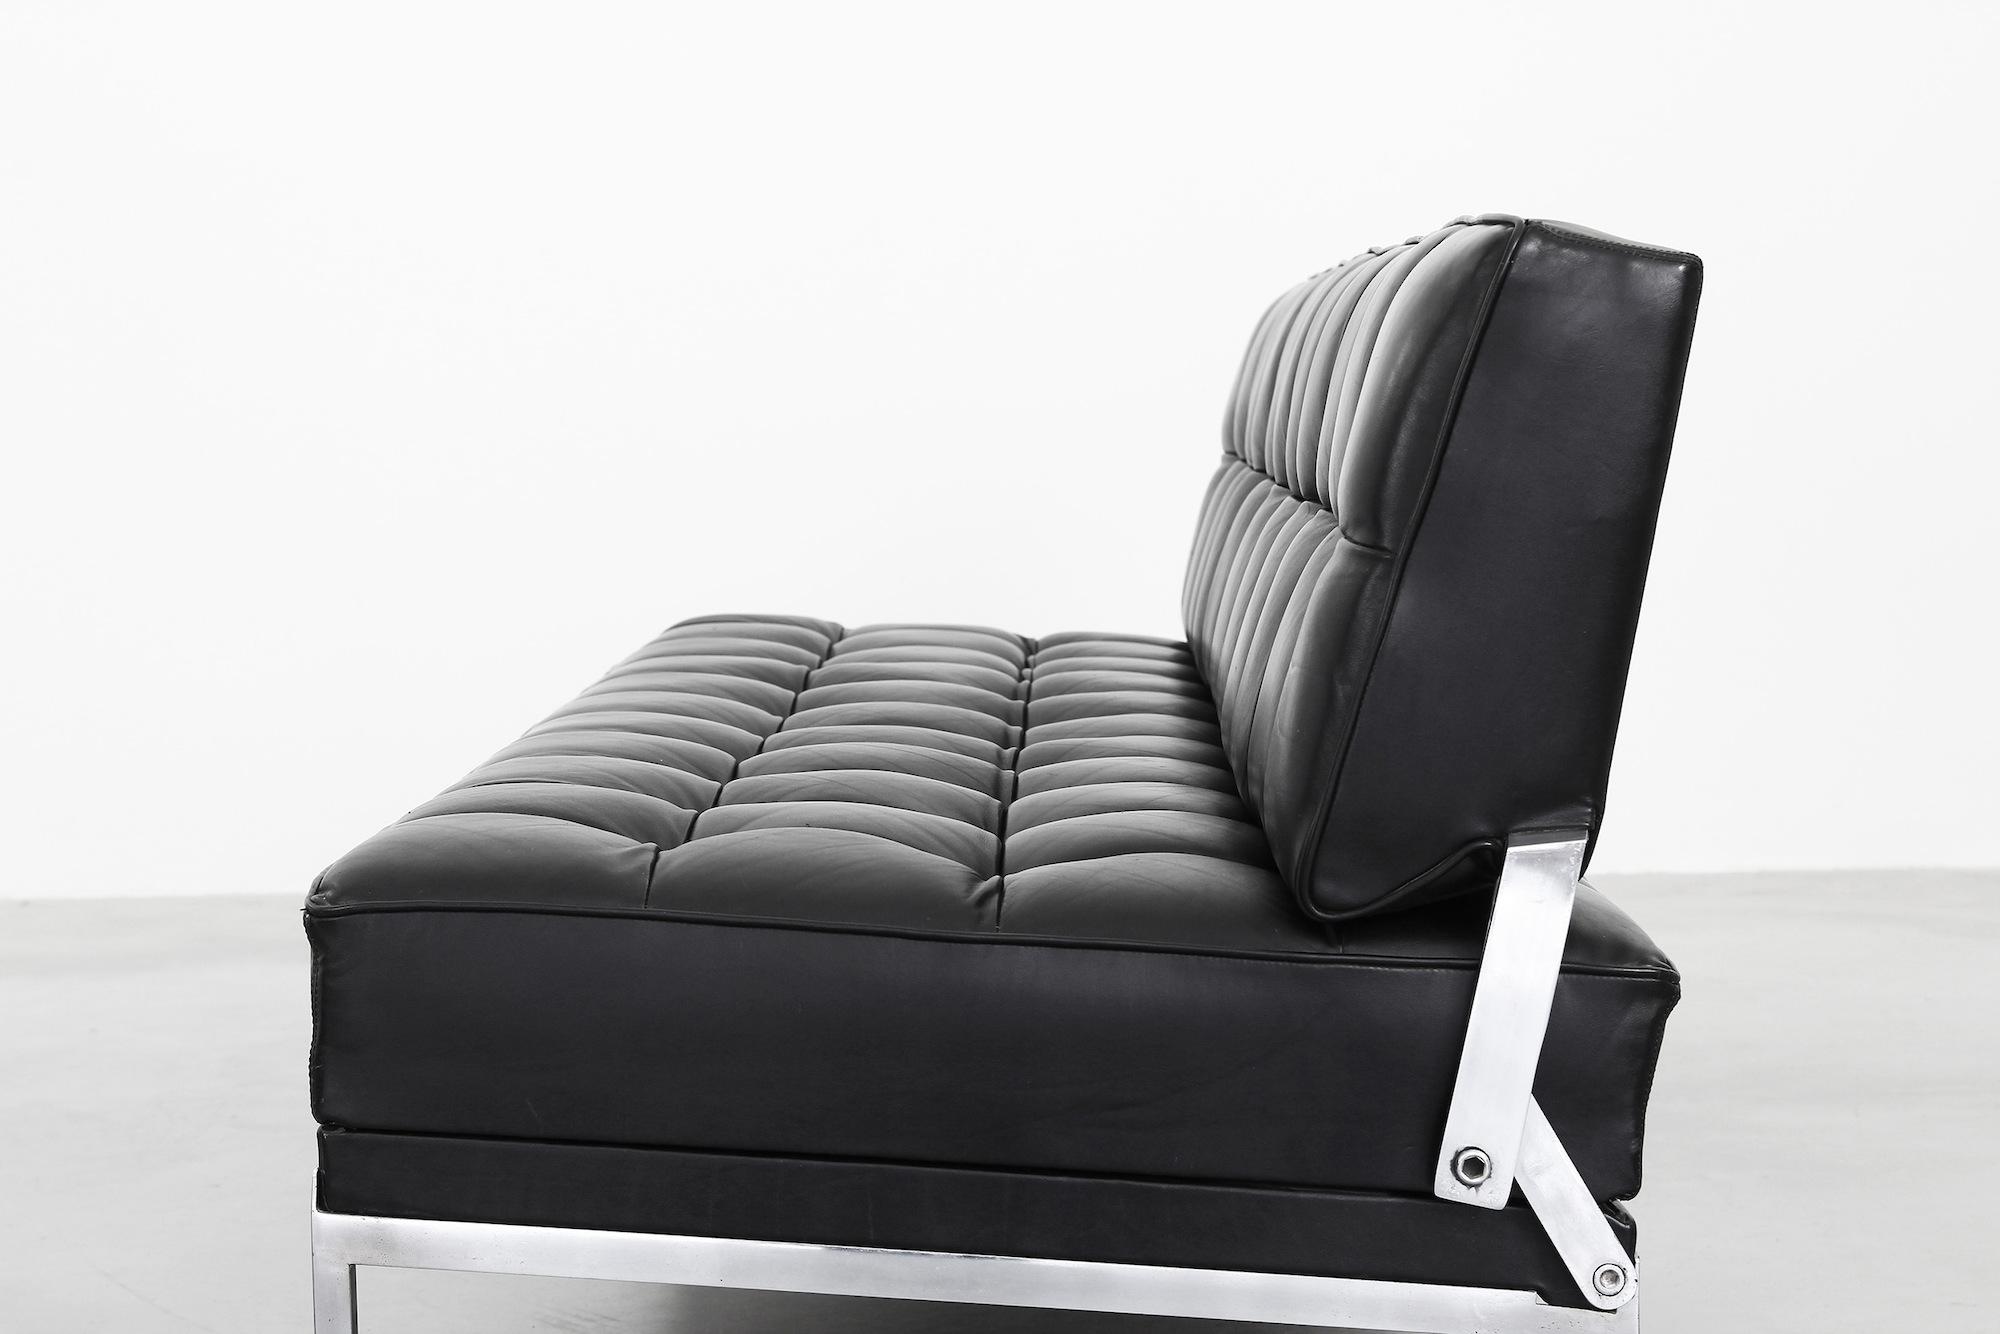 galerie bachmann sofa von johannes spalt f r wittmann. Black Bedroom Furniture Sets. Home Design Ideas